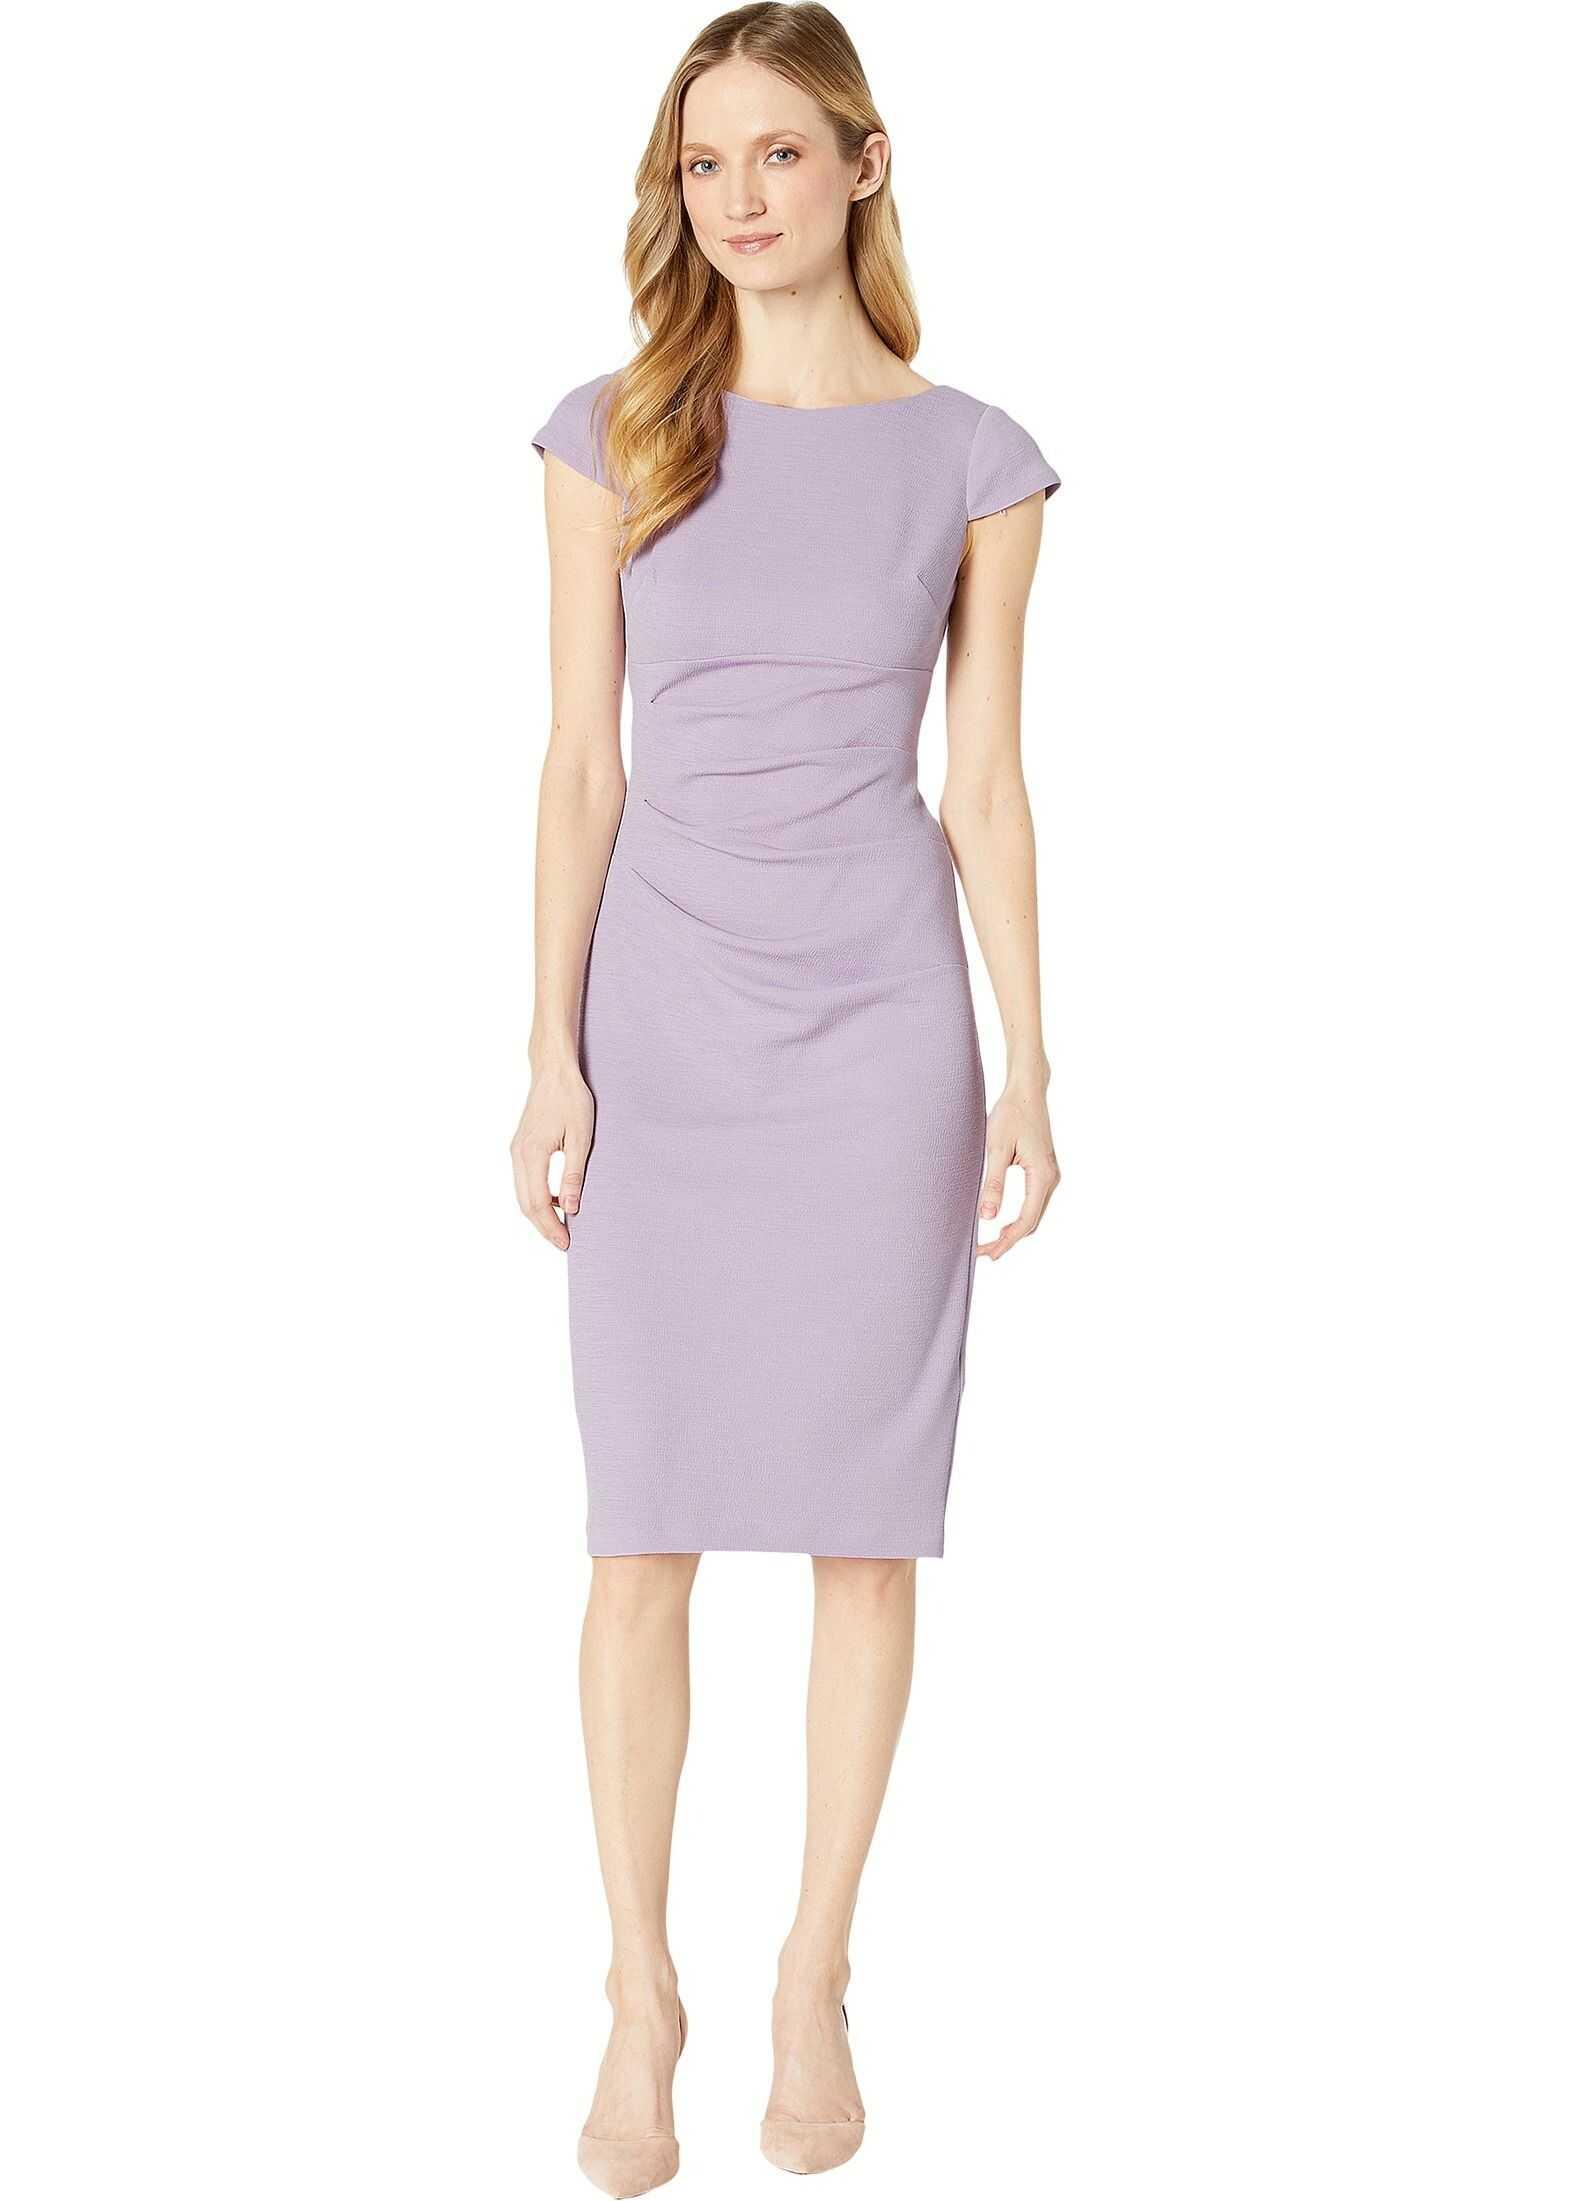 Adrianna Papell Rio Knit Tucked Sheath Dress Iced Lilac